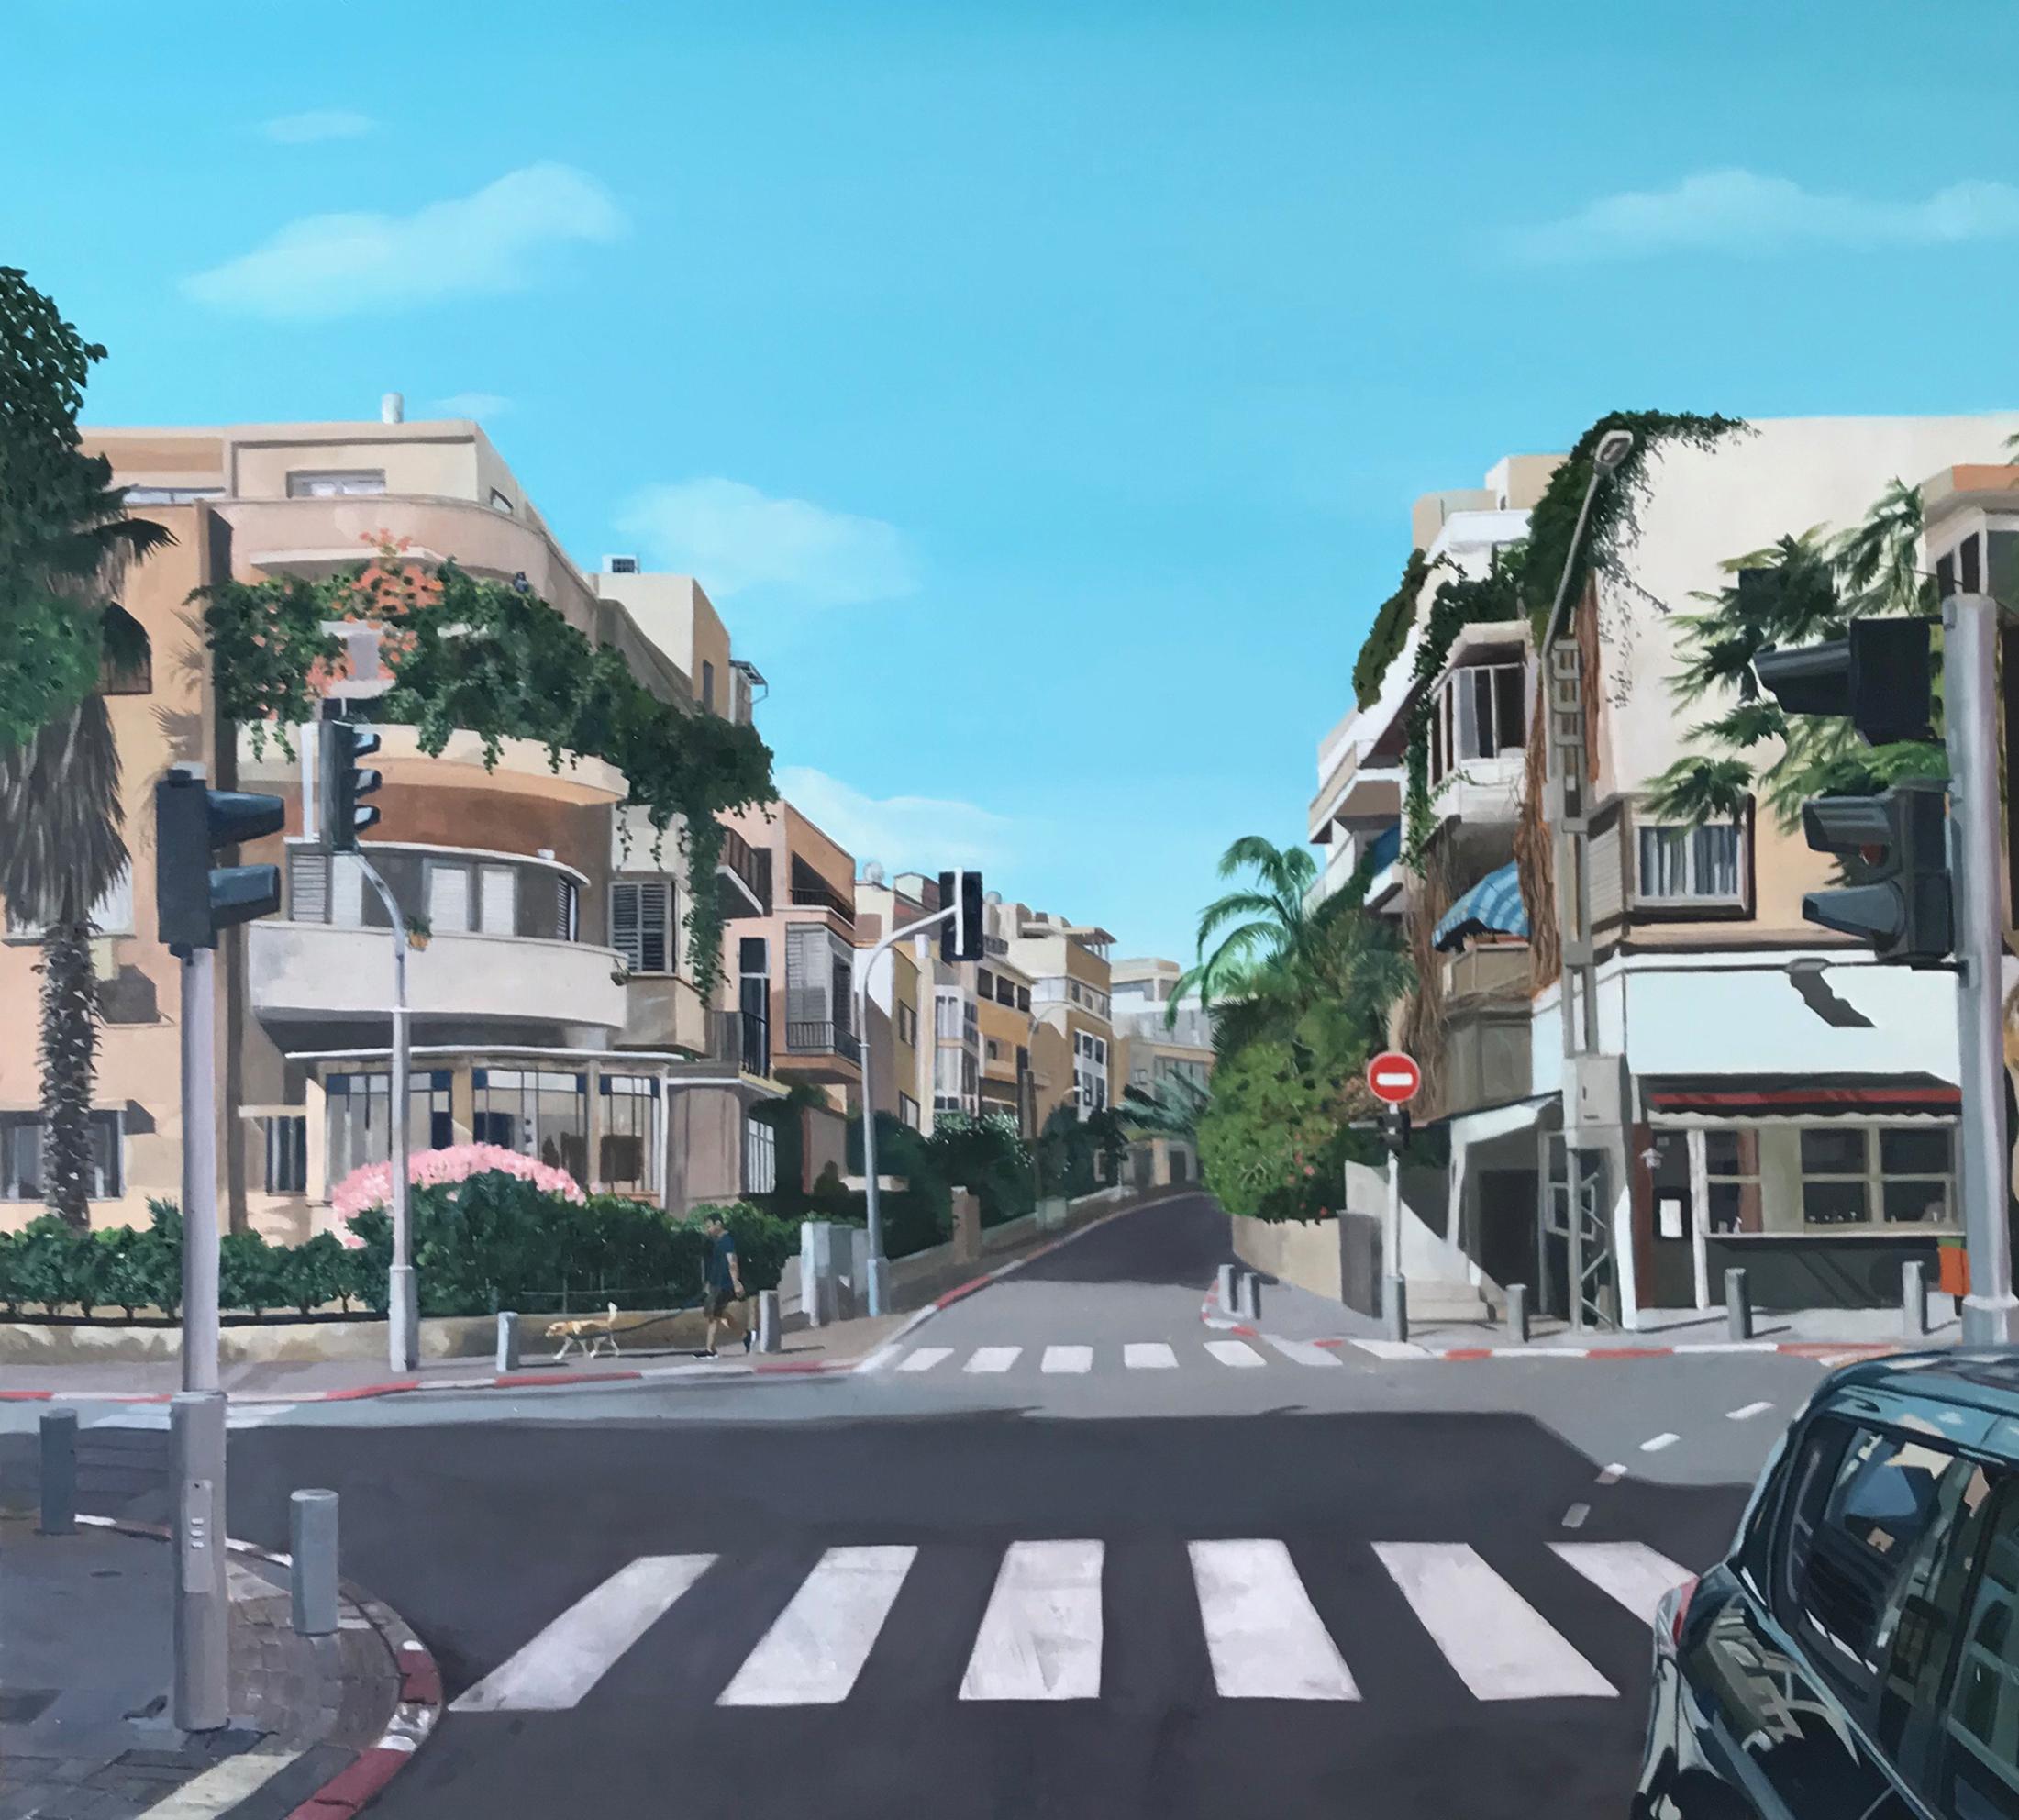 Tel Aviv, The White City V. Tel Aviv, The White City V. Zohar Flax. Jackson's Painting Prize.